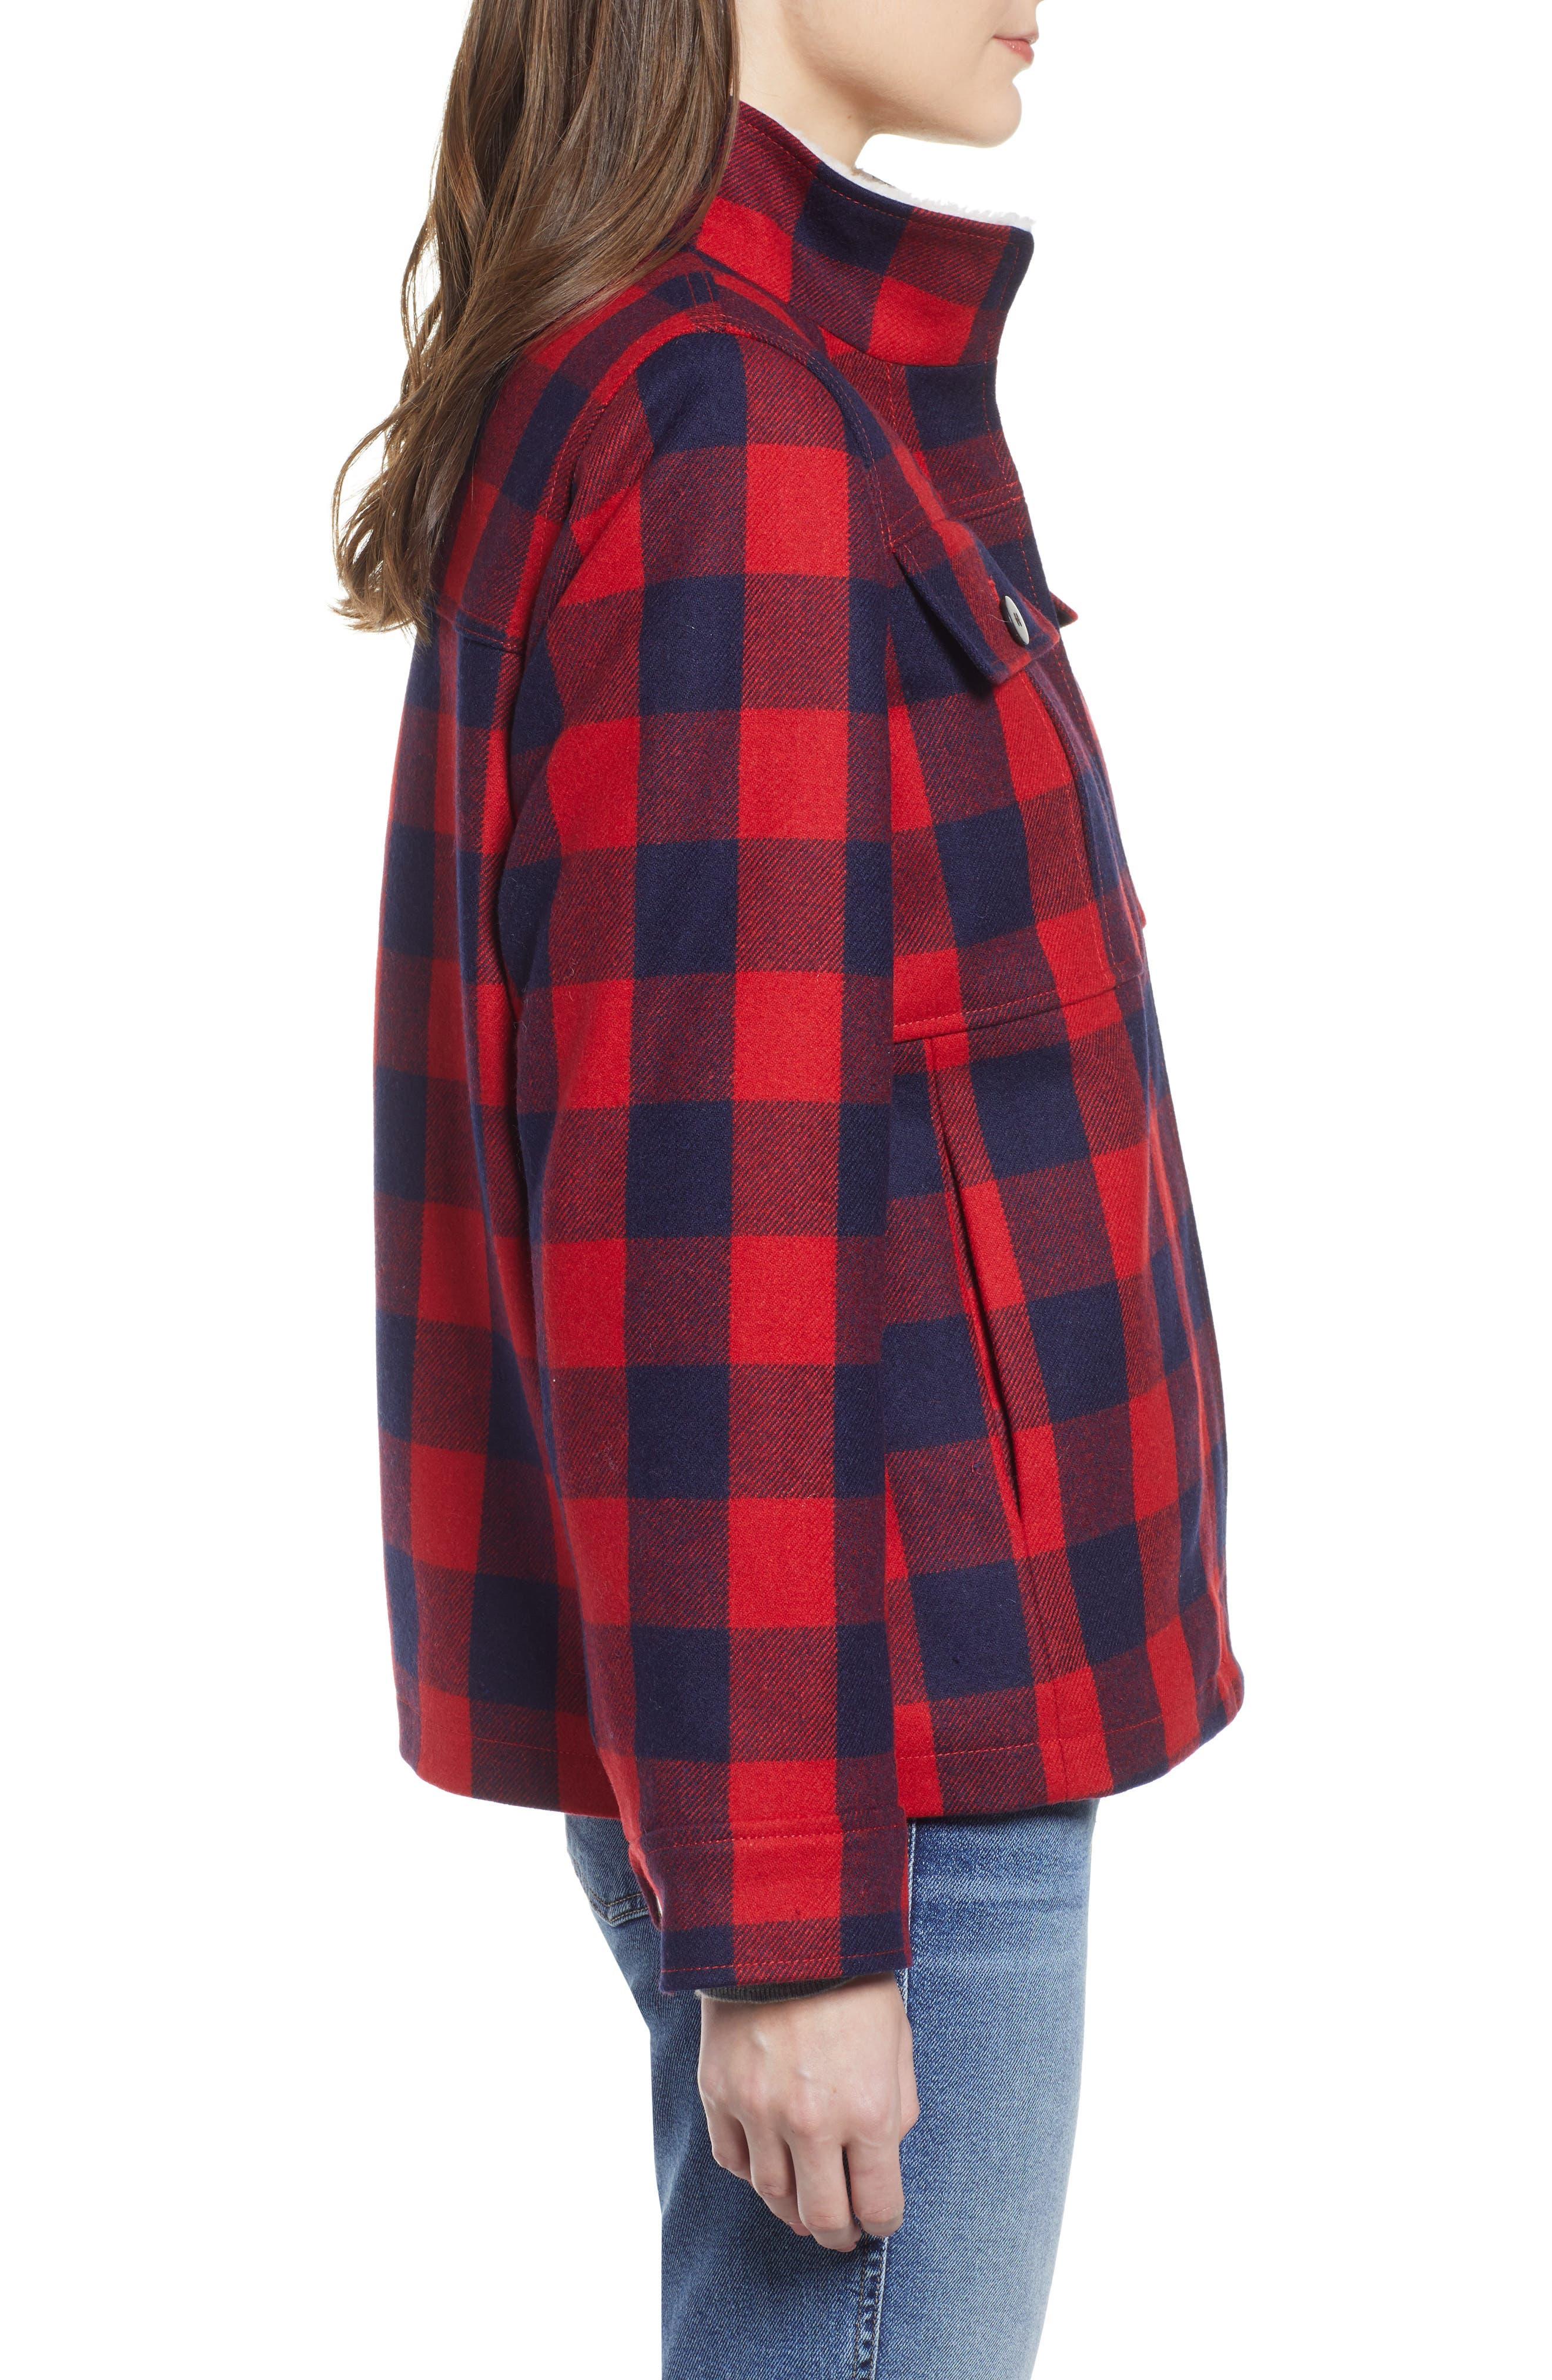 Buffalo Check Workwear Jacket with Faux Shearling Lining,                             Alternate thumbnail 3, color,                             RED NAVY BUFFALO